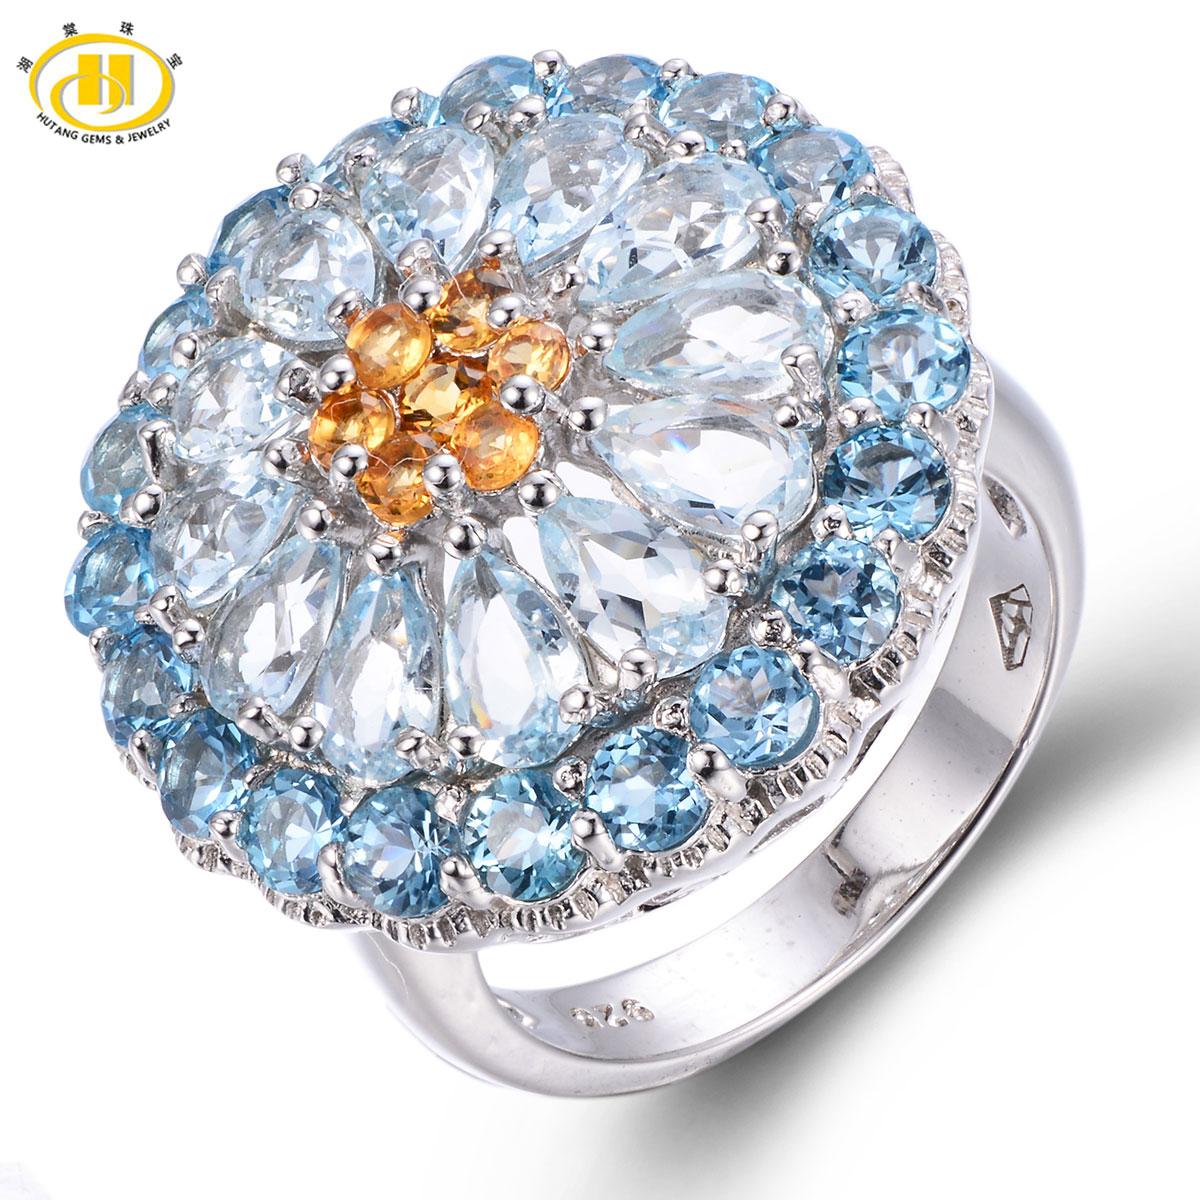 Hutang 5.54ct Genuine Aquamarine & Blue Topaz Solid 925 Sterling Silver Cluster Ring Gemstone Luxury Fine Jewelry Wedding Rings